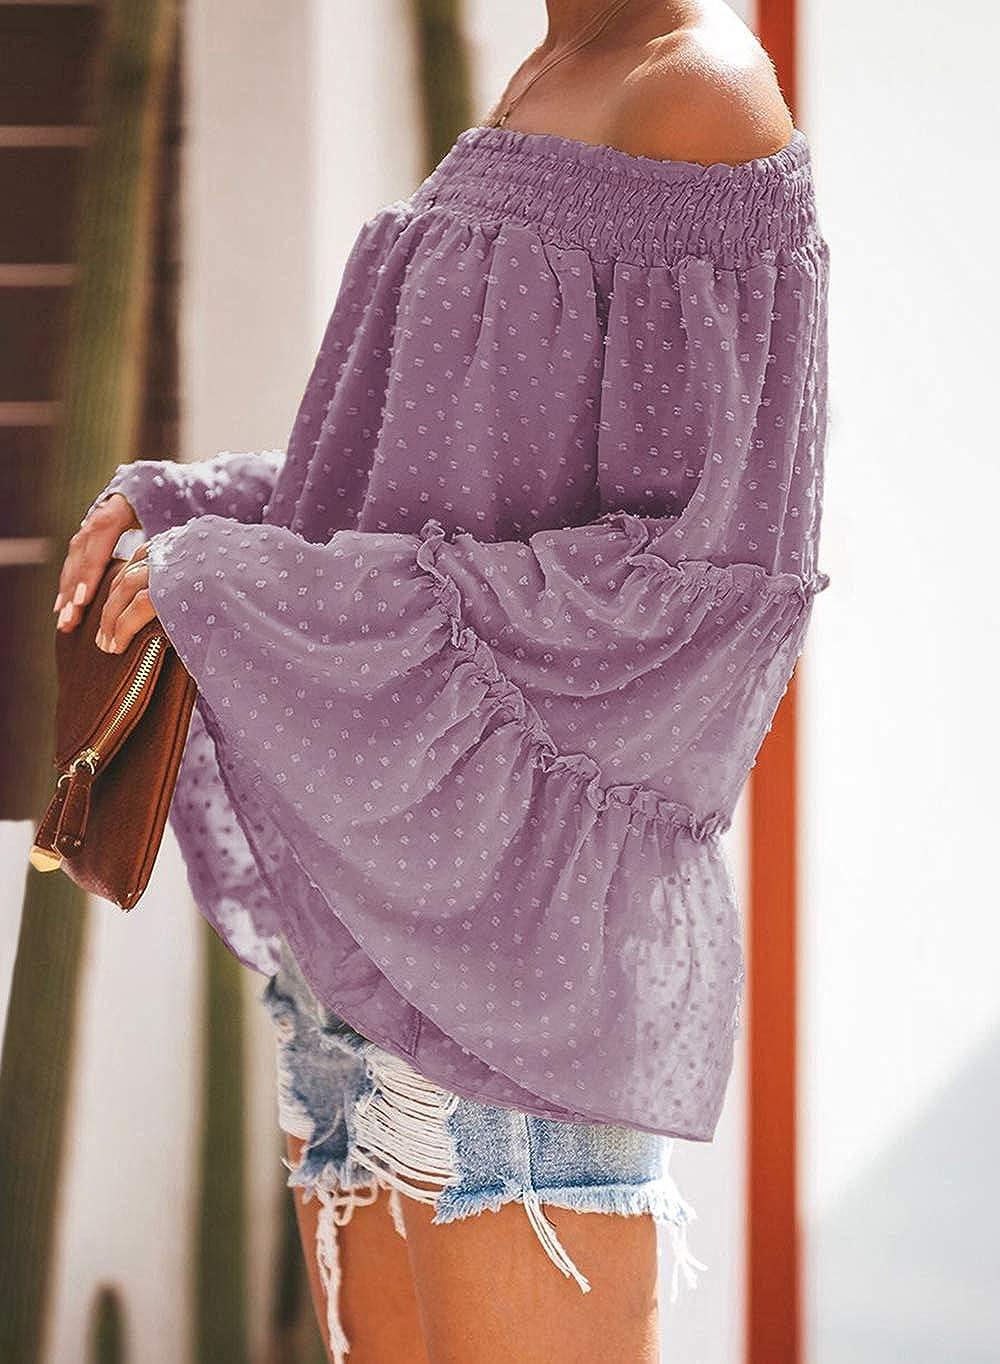 KIRUNDO 2021 Women/'s Spring Summer Chiffon Blouse Off Shoulder Swiss Dot 3//4 Bell Sleeves Ruffle Tunic Top